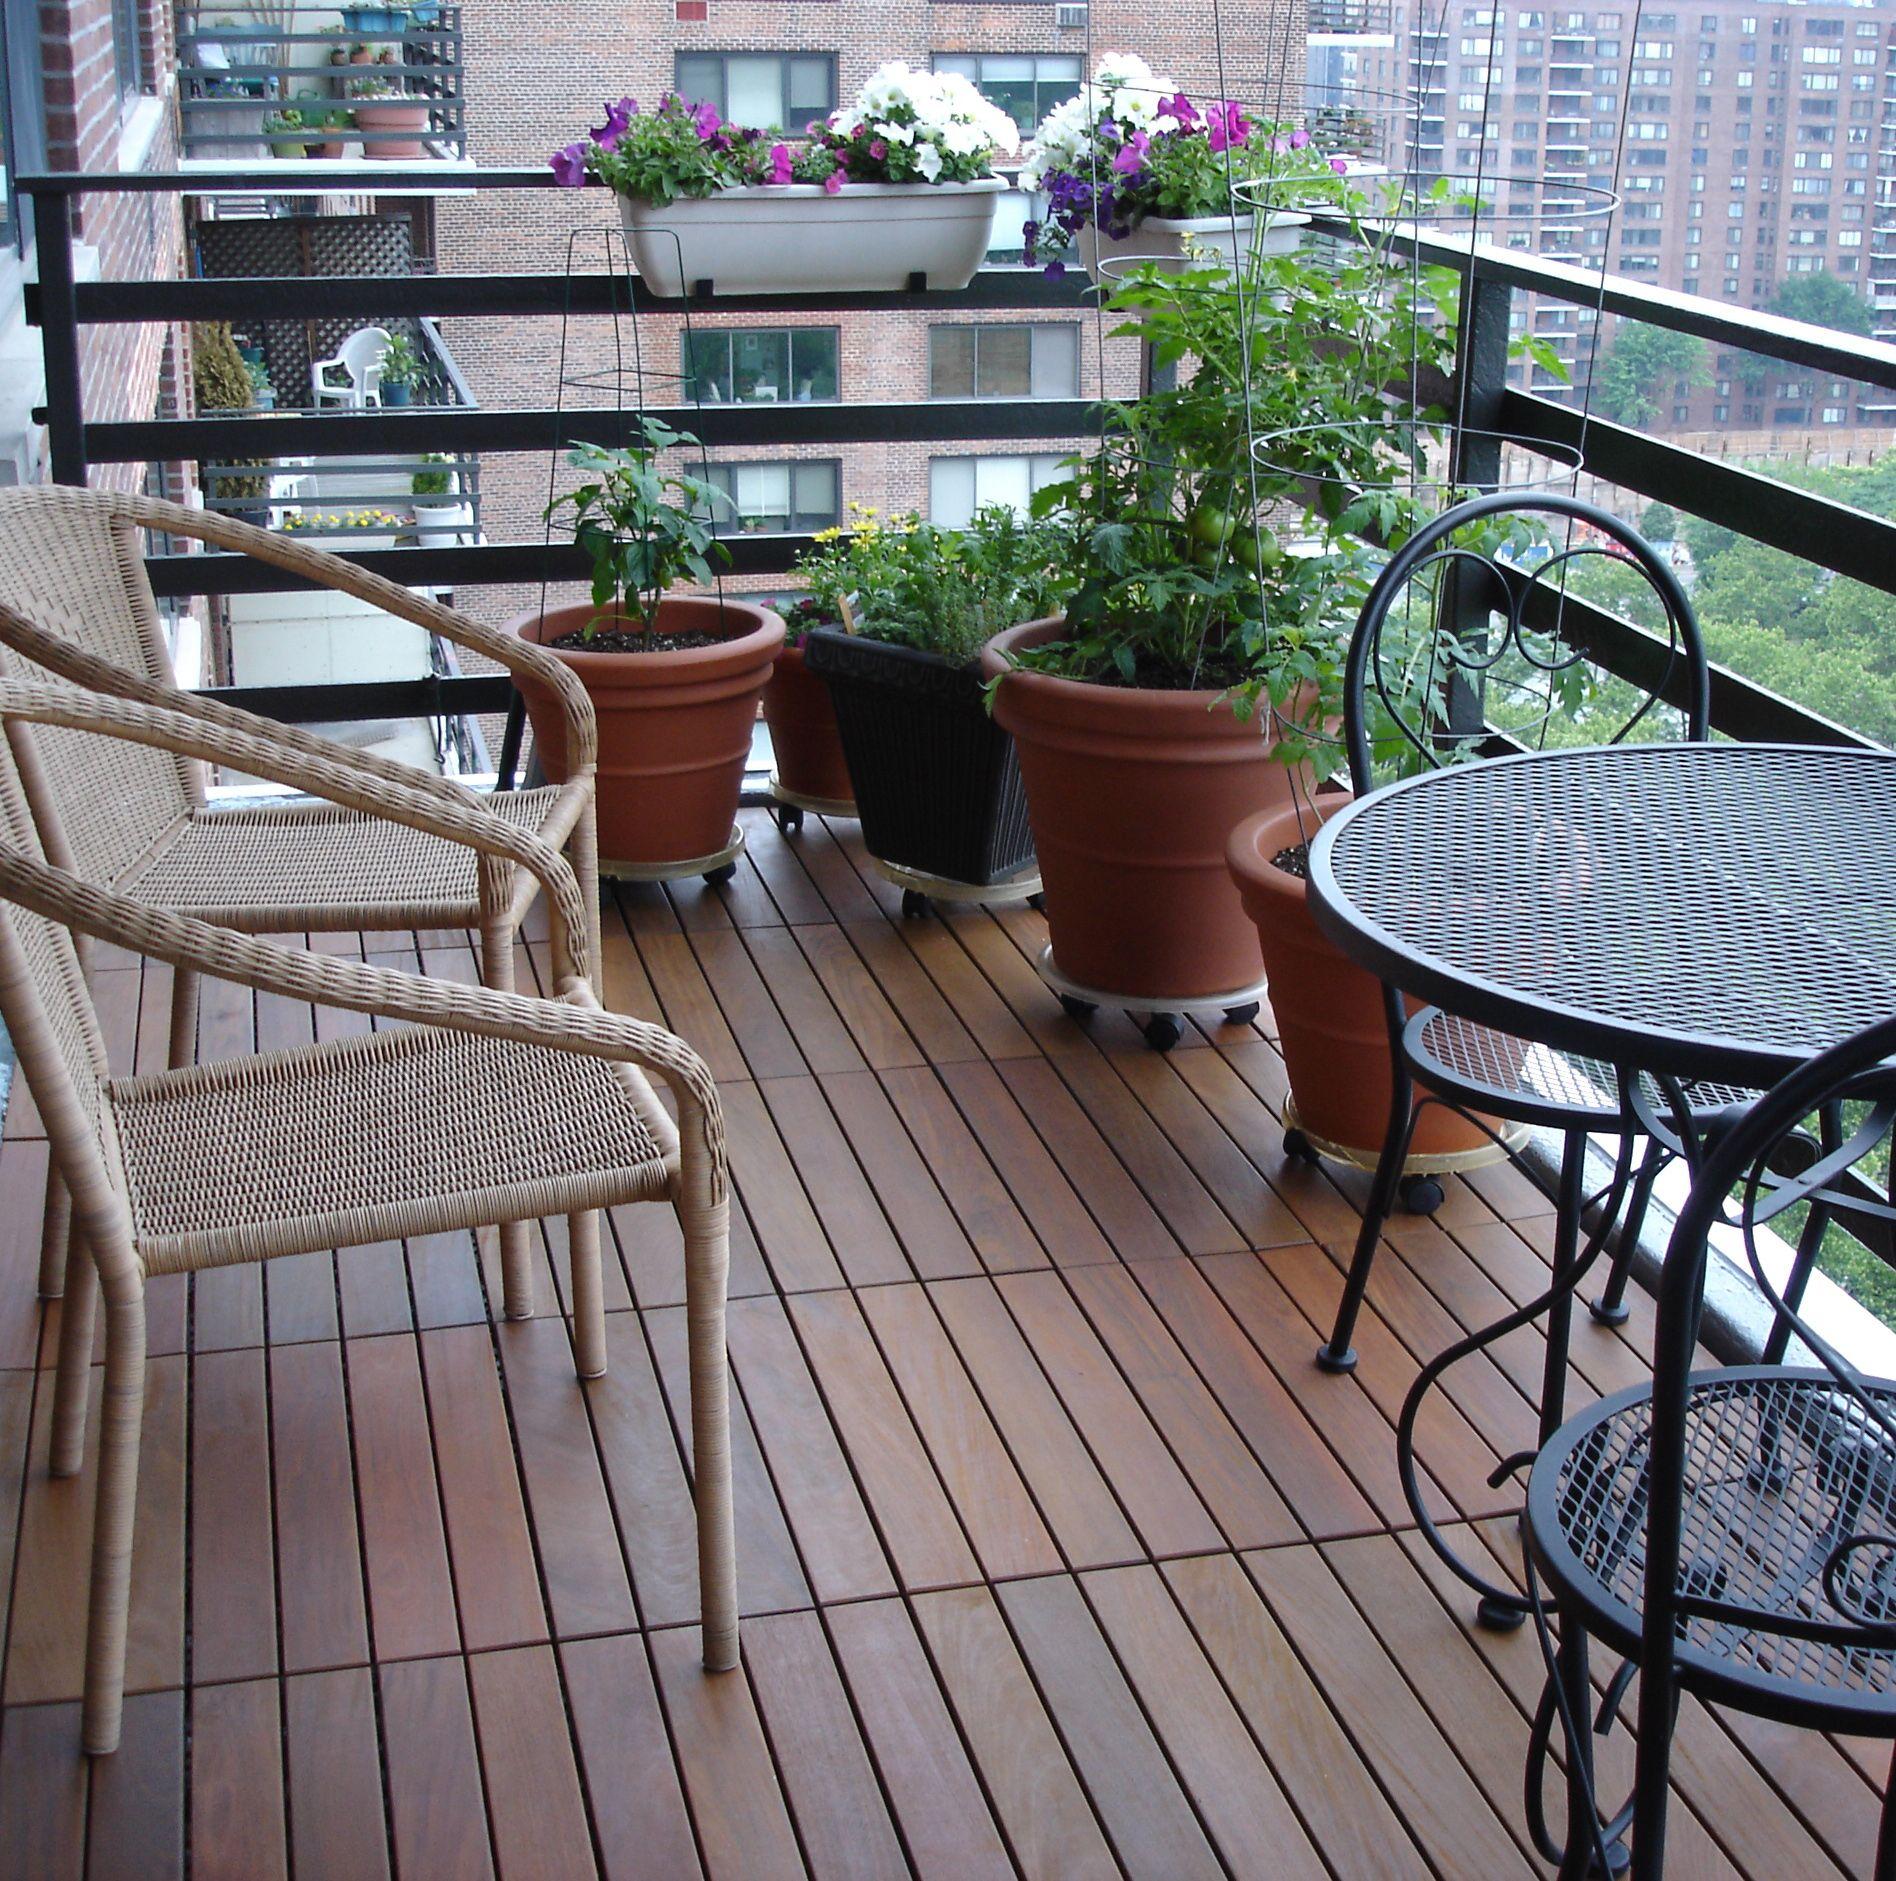 Swiftdeck Ipe Wood Interlocking Tiles Liven Up Your